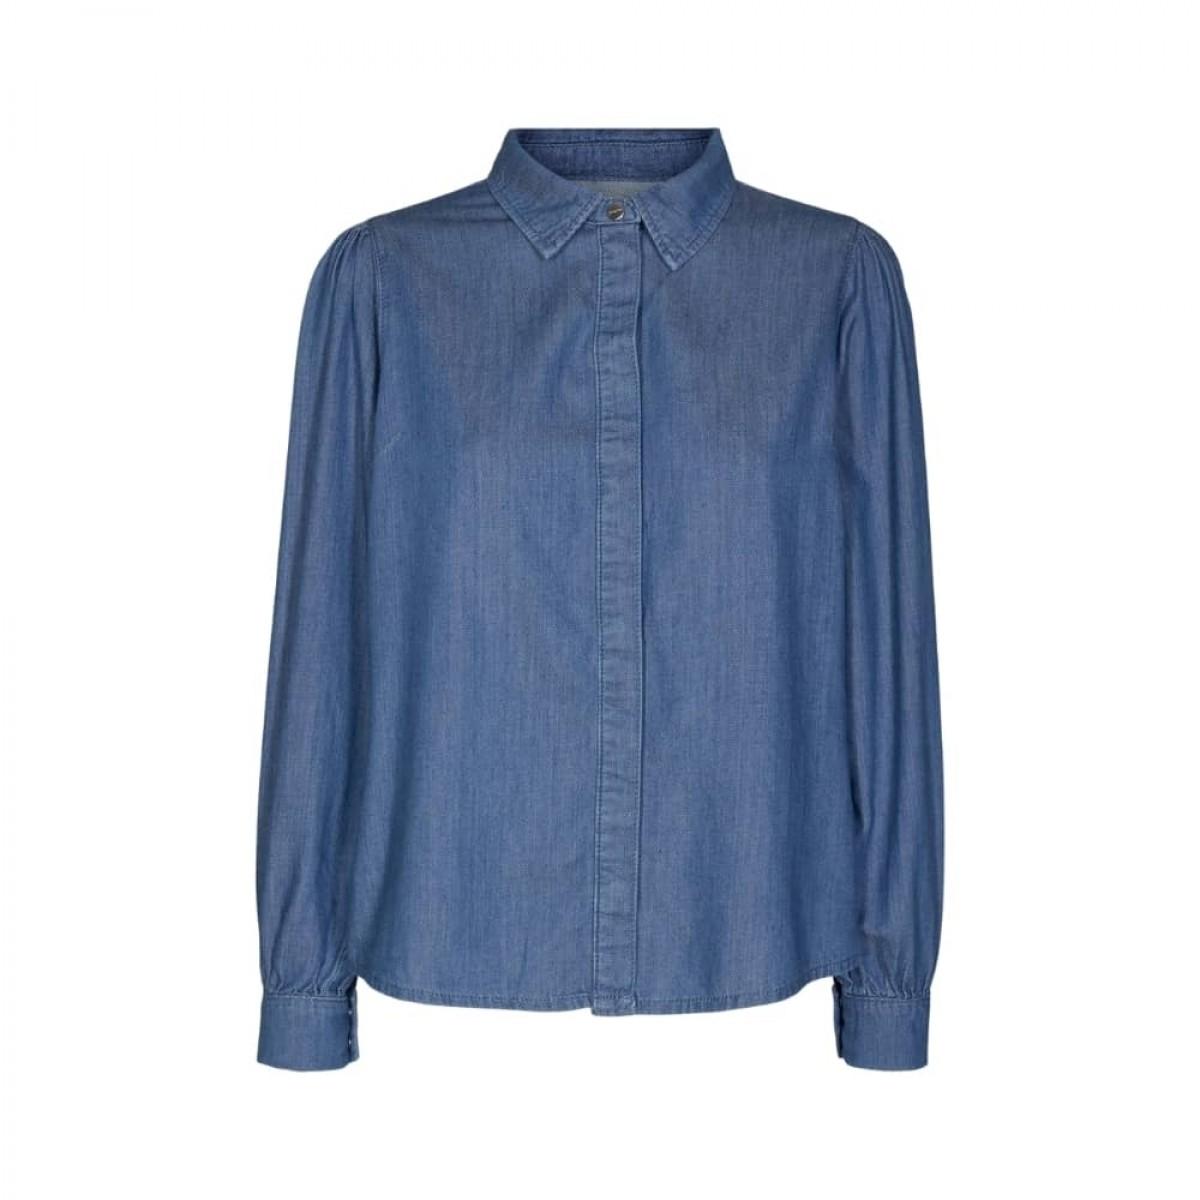 hepburn 70's skjorte - denim blue - front